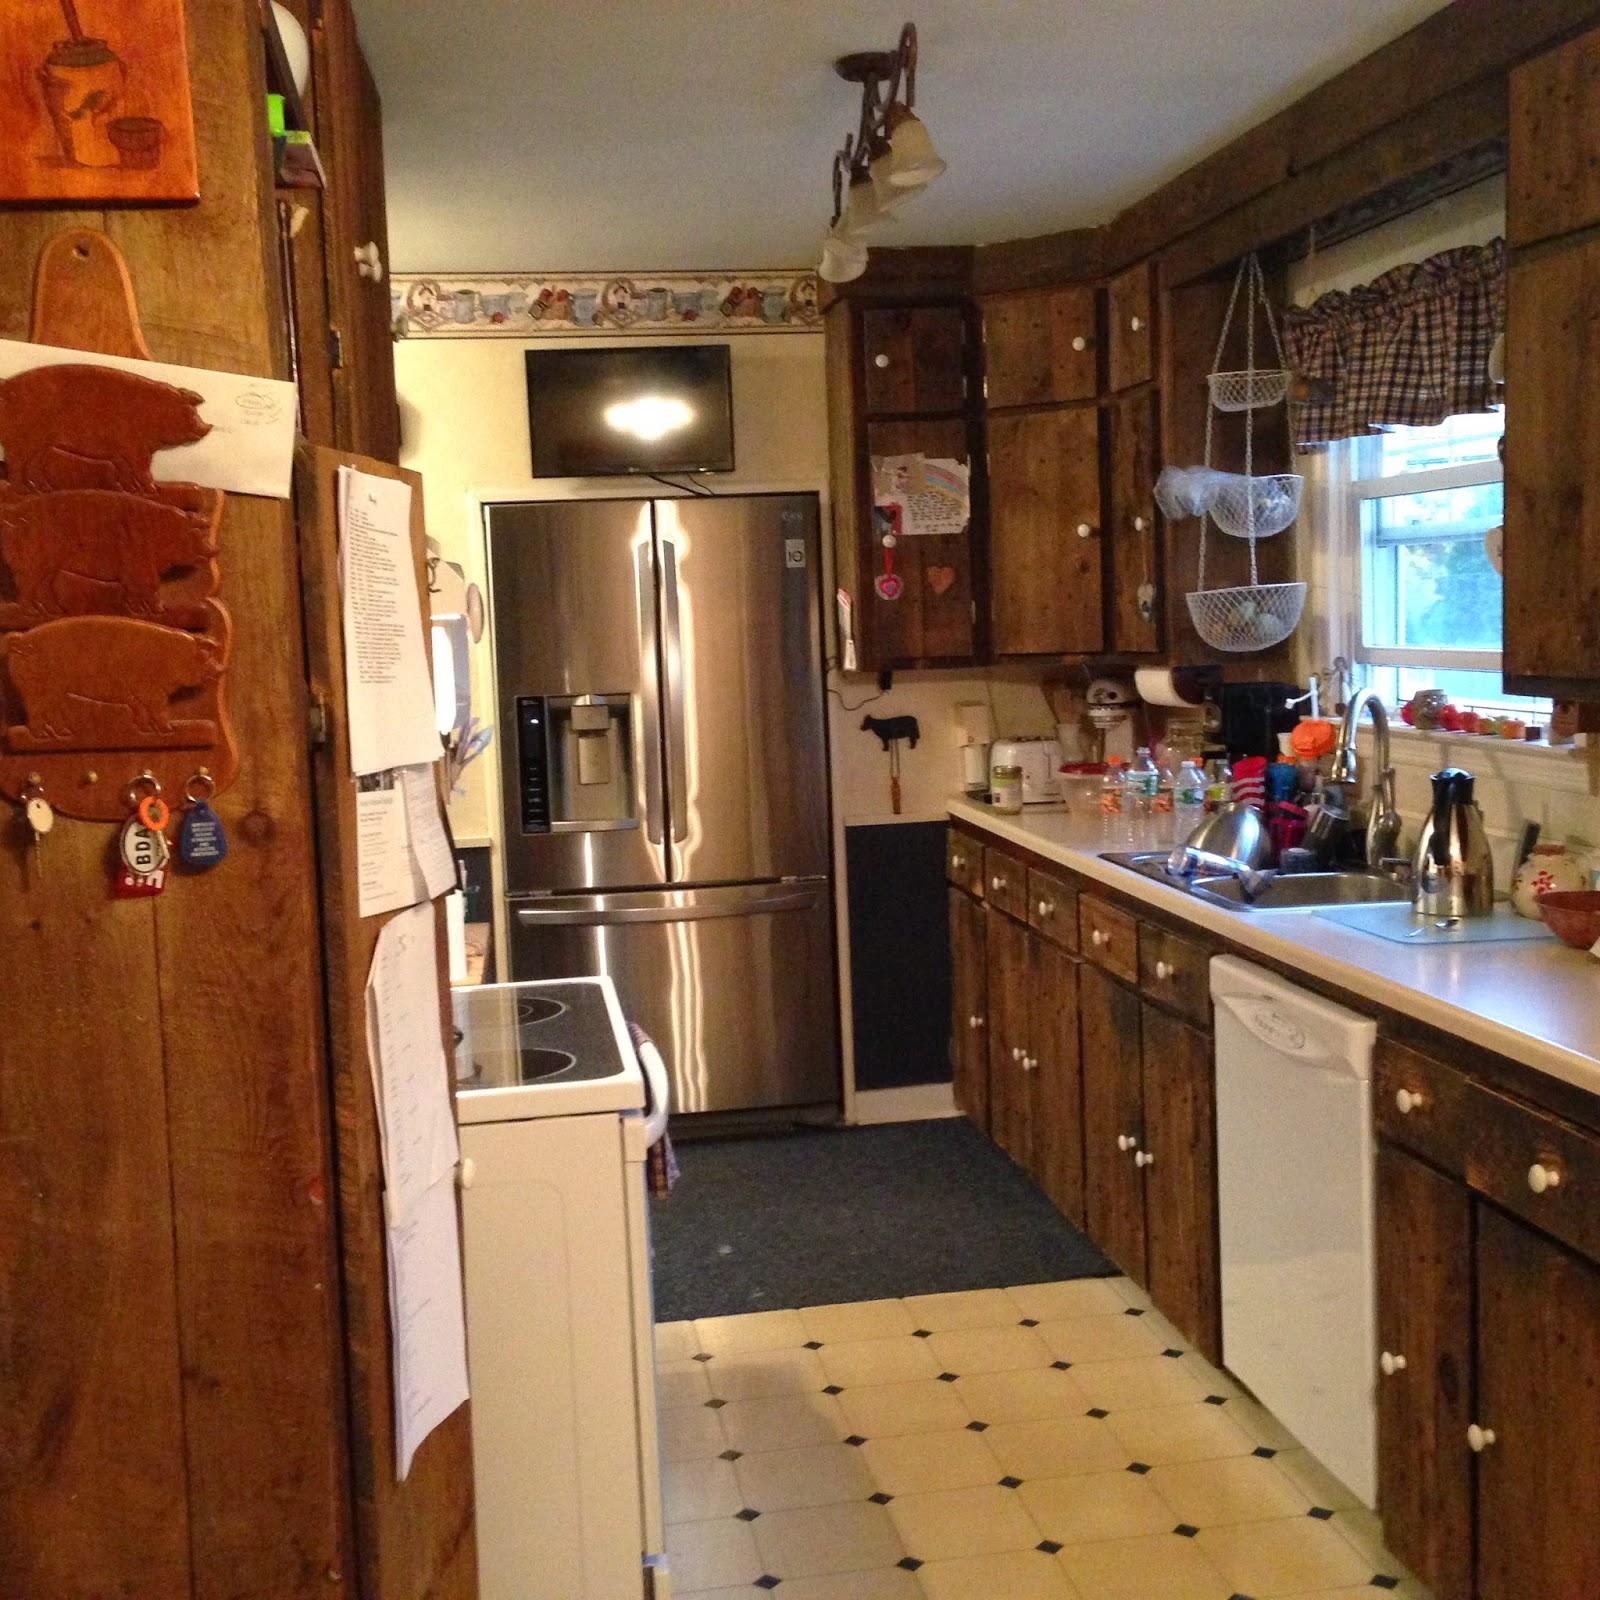 8th Day: Kitchen Rehab